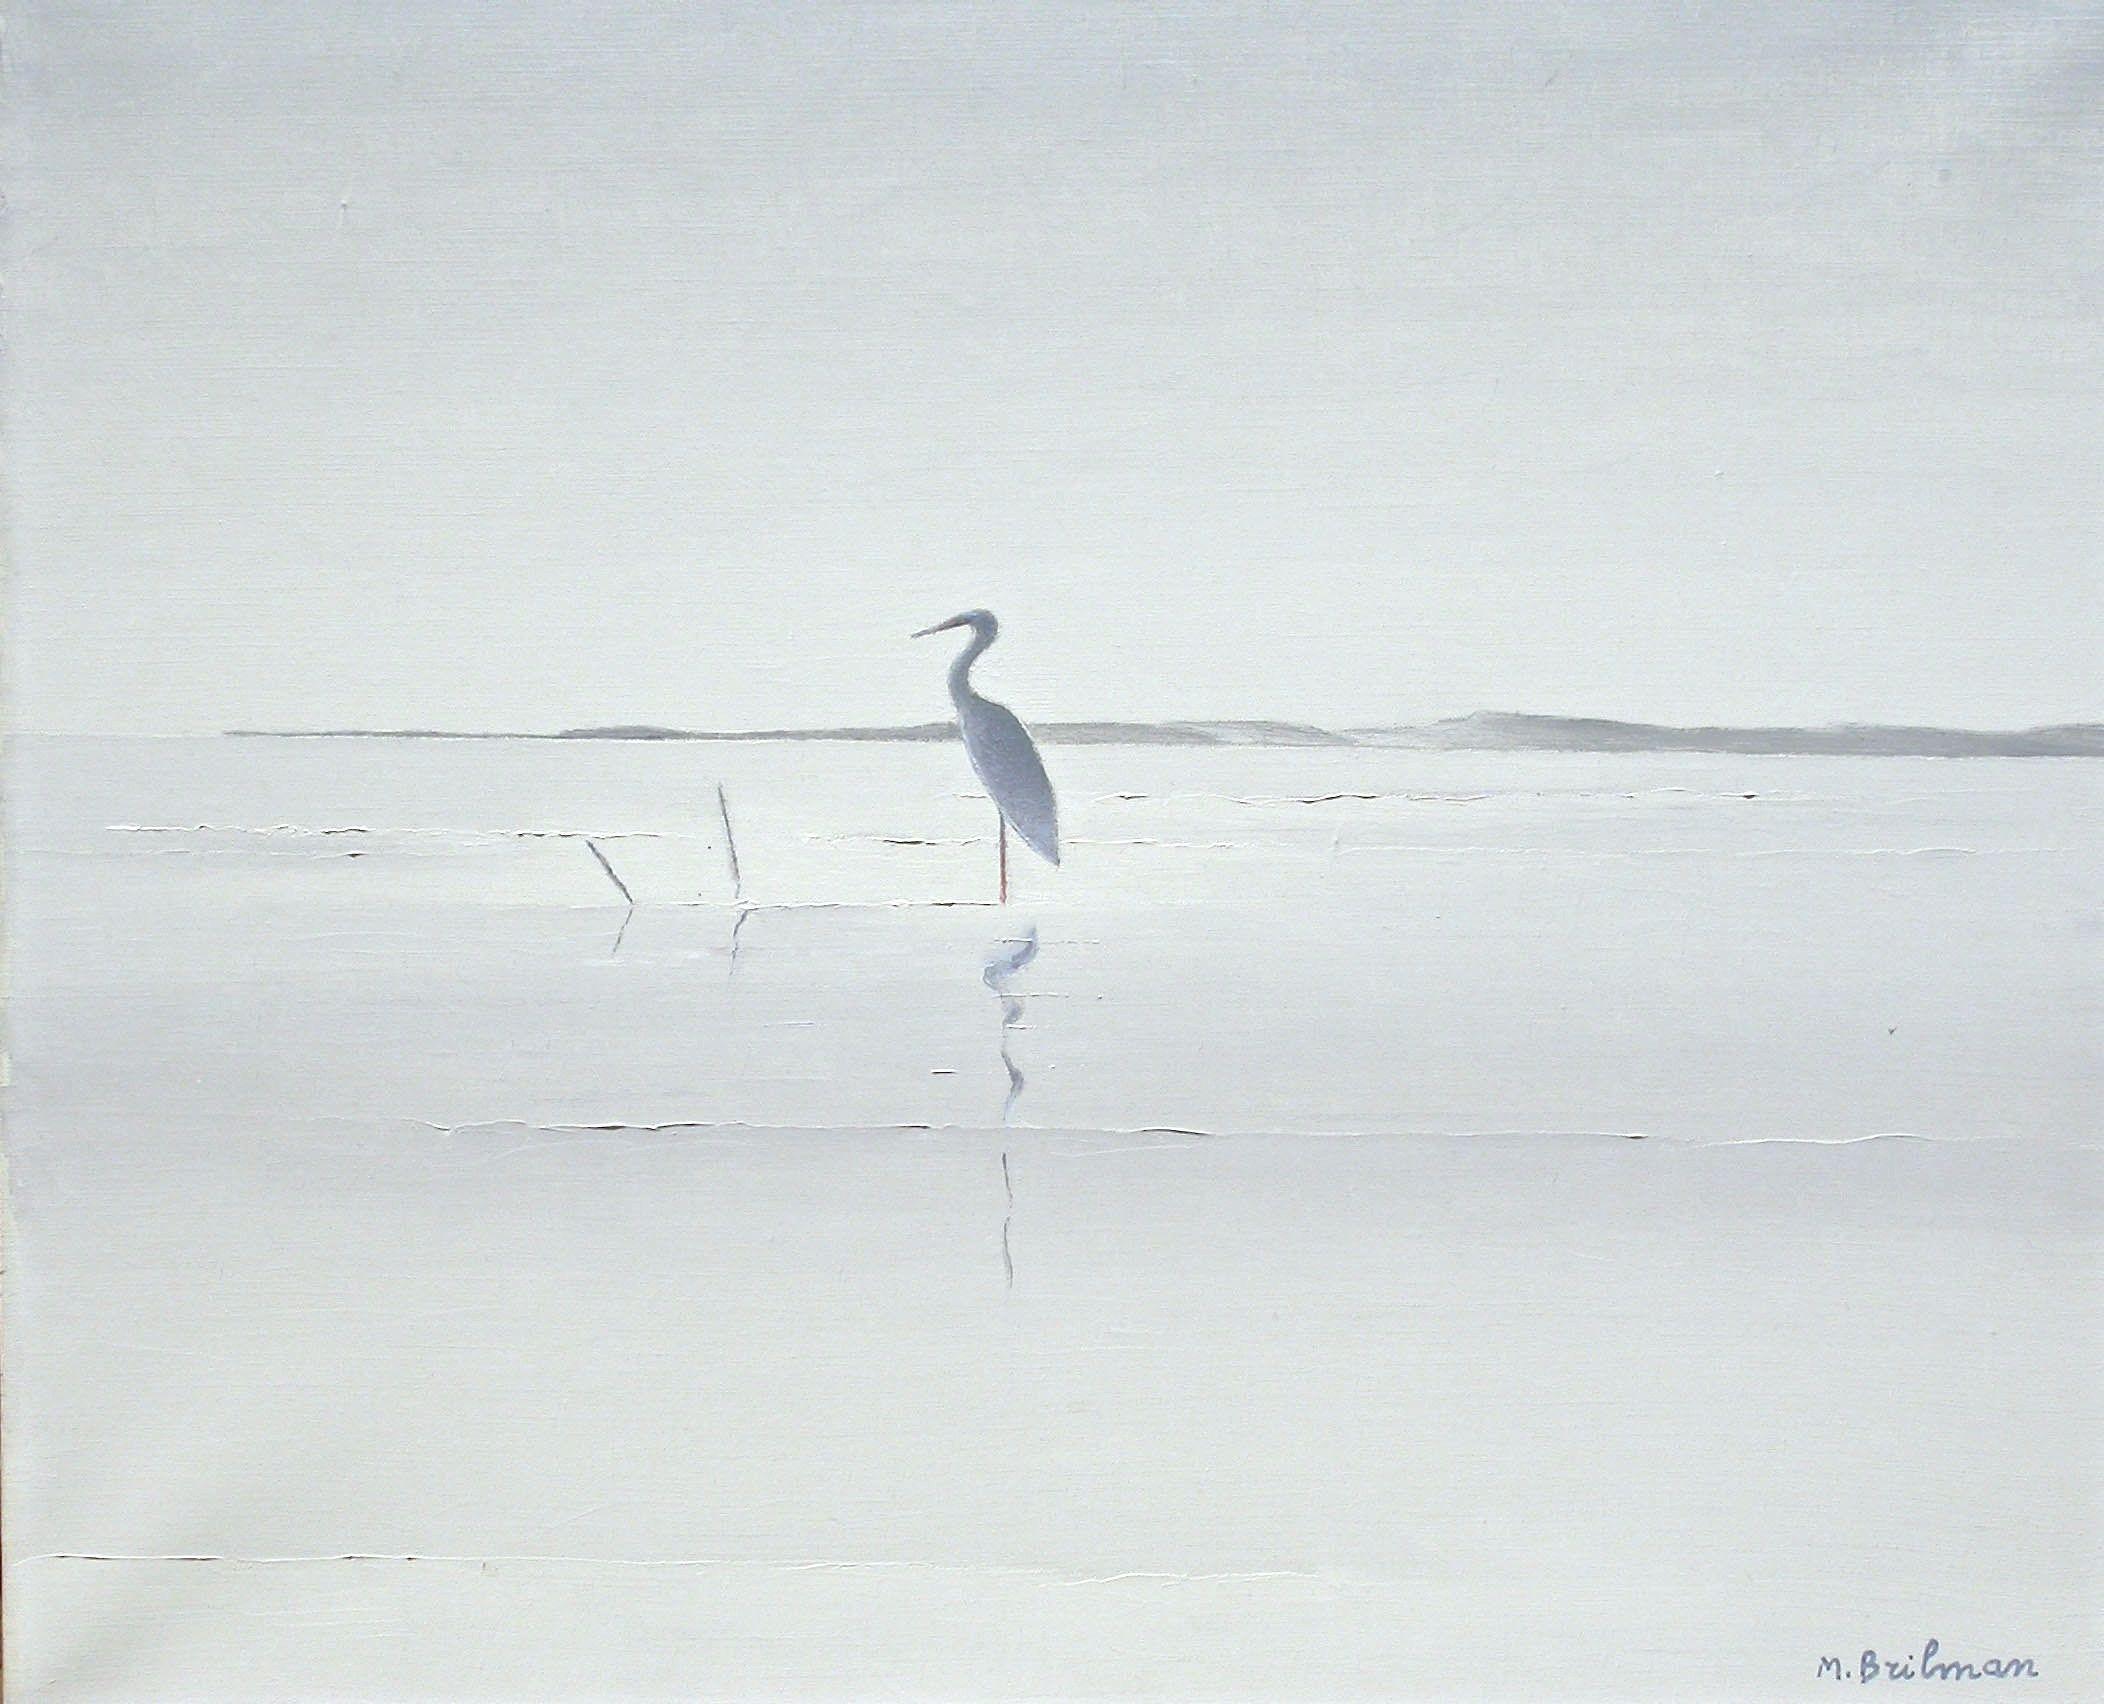 Gray heron in Casamance